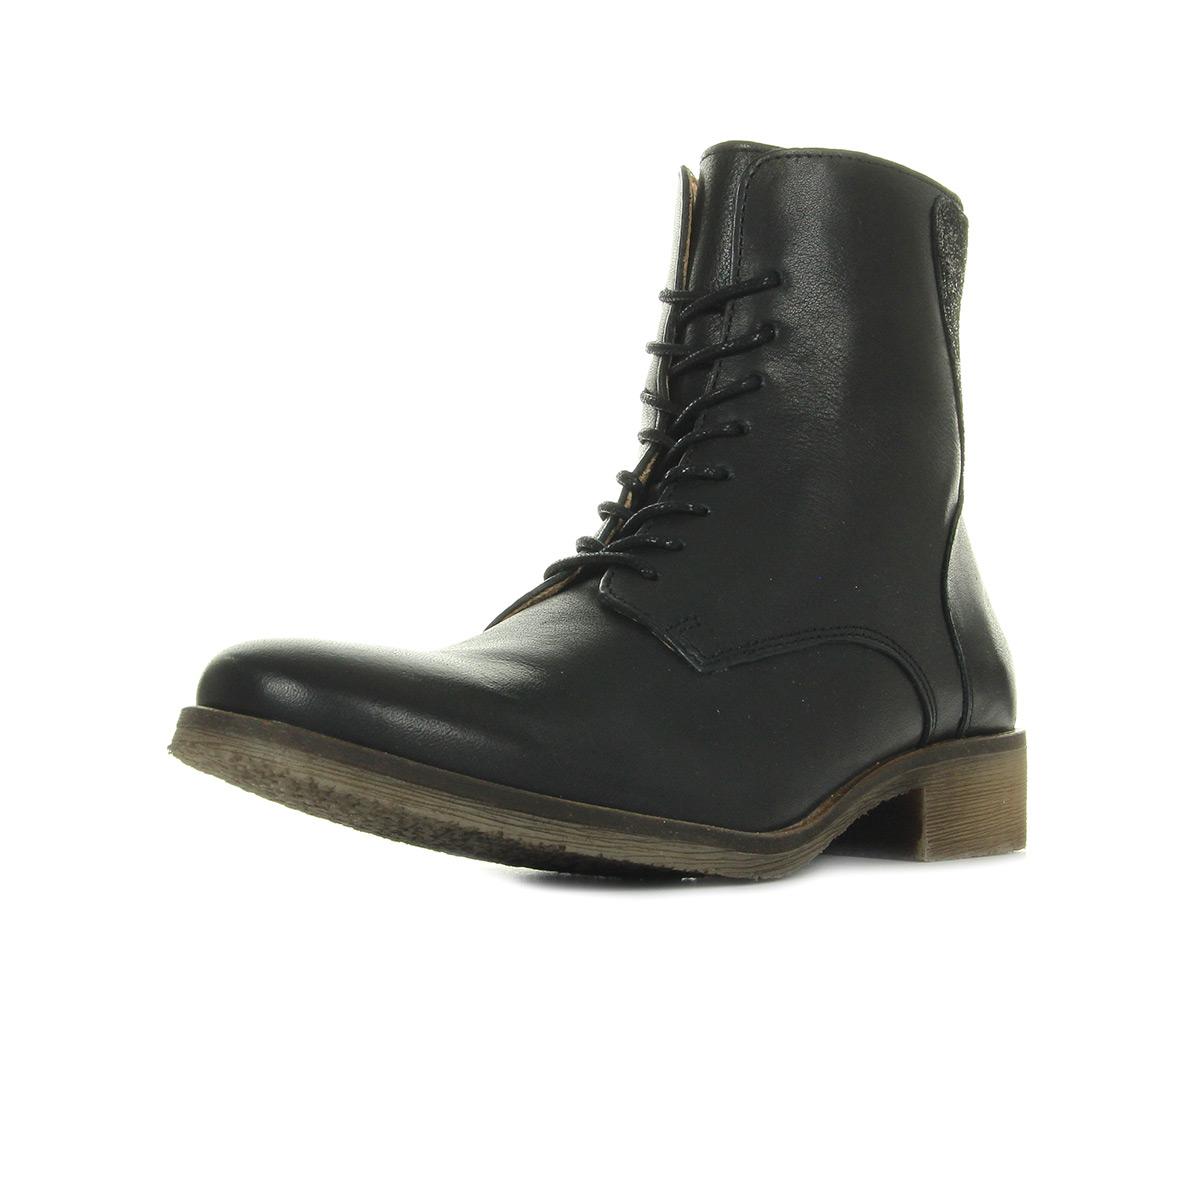 Kickers Lifebis Cuir Natur Noir noir - Chaussures Bottine Femme